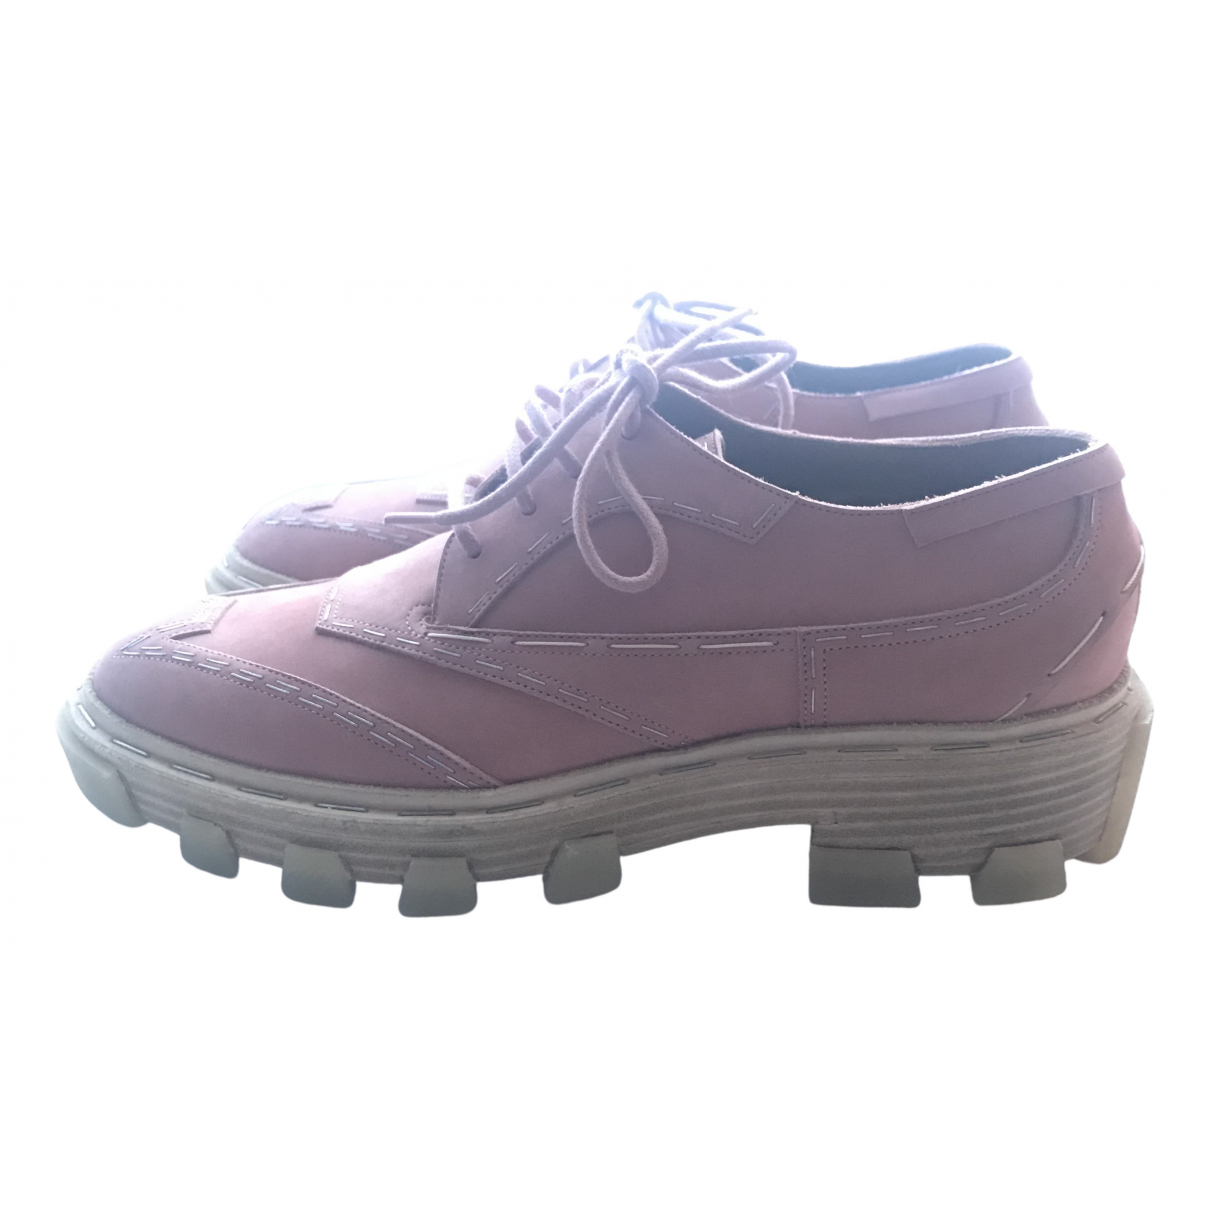 Balenciaga \N Pink Leather Lace ups for Women 38 EU